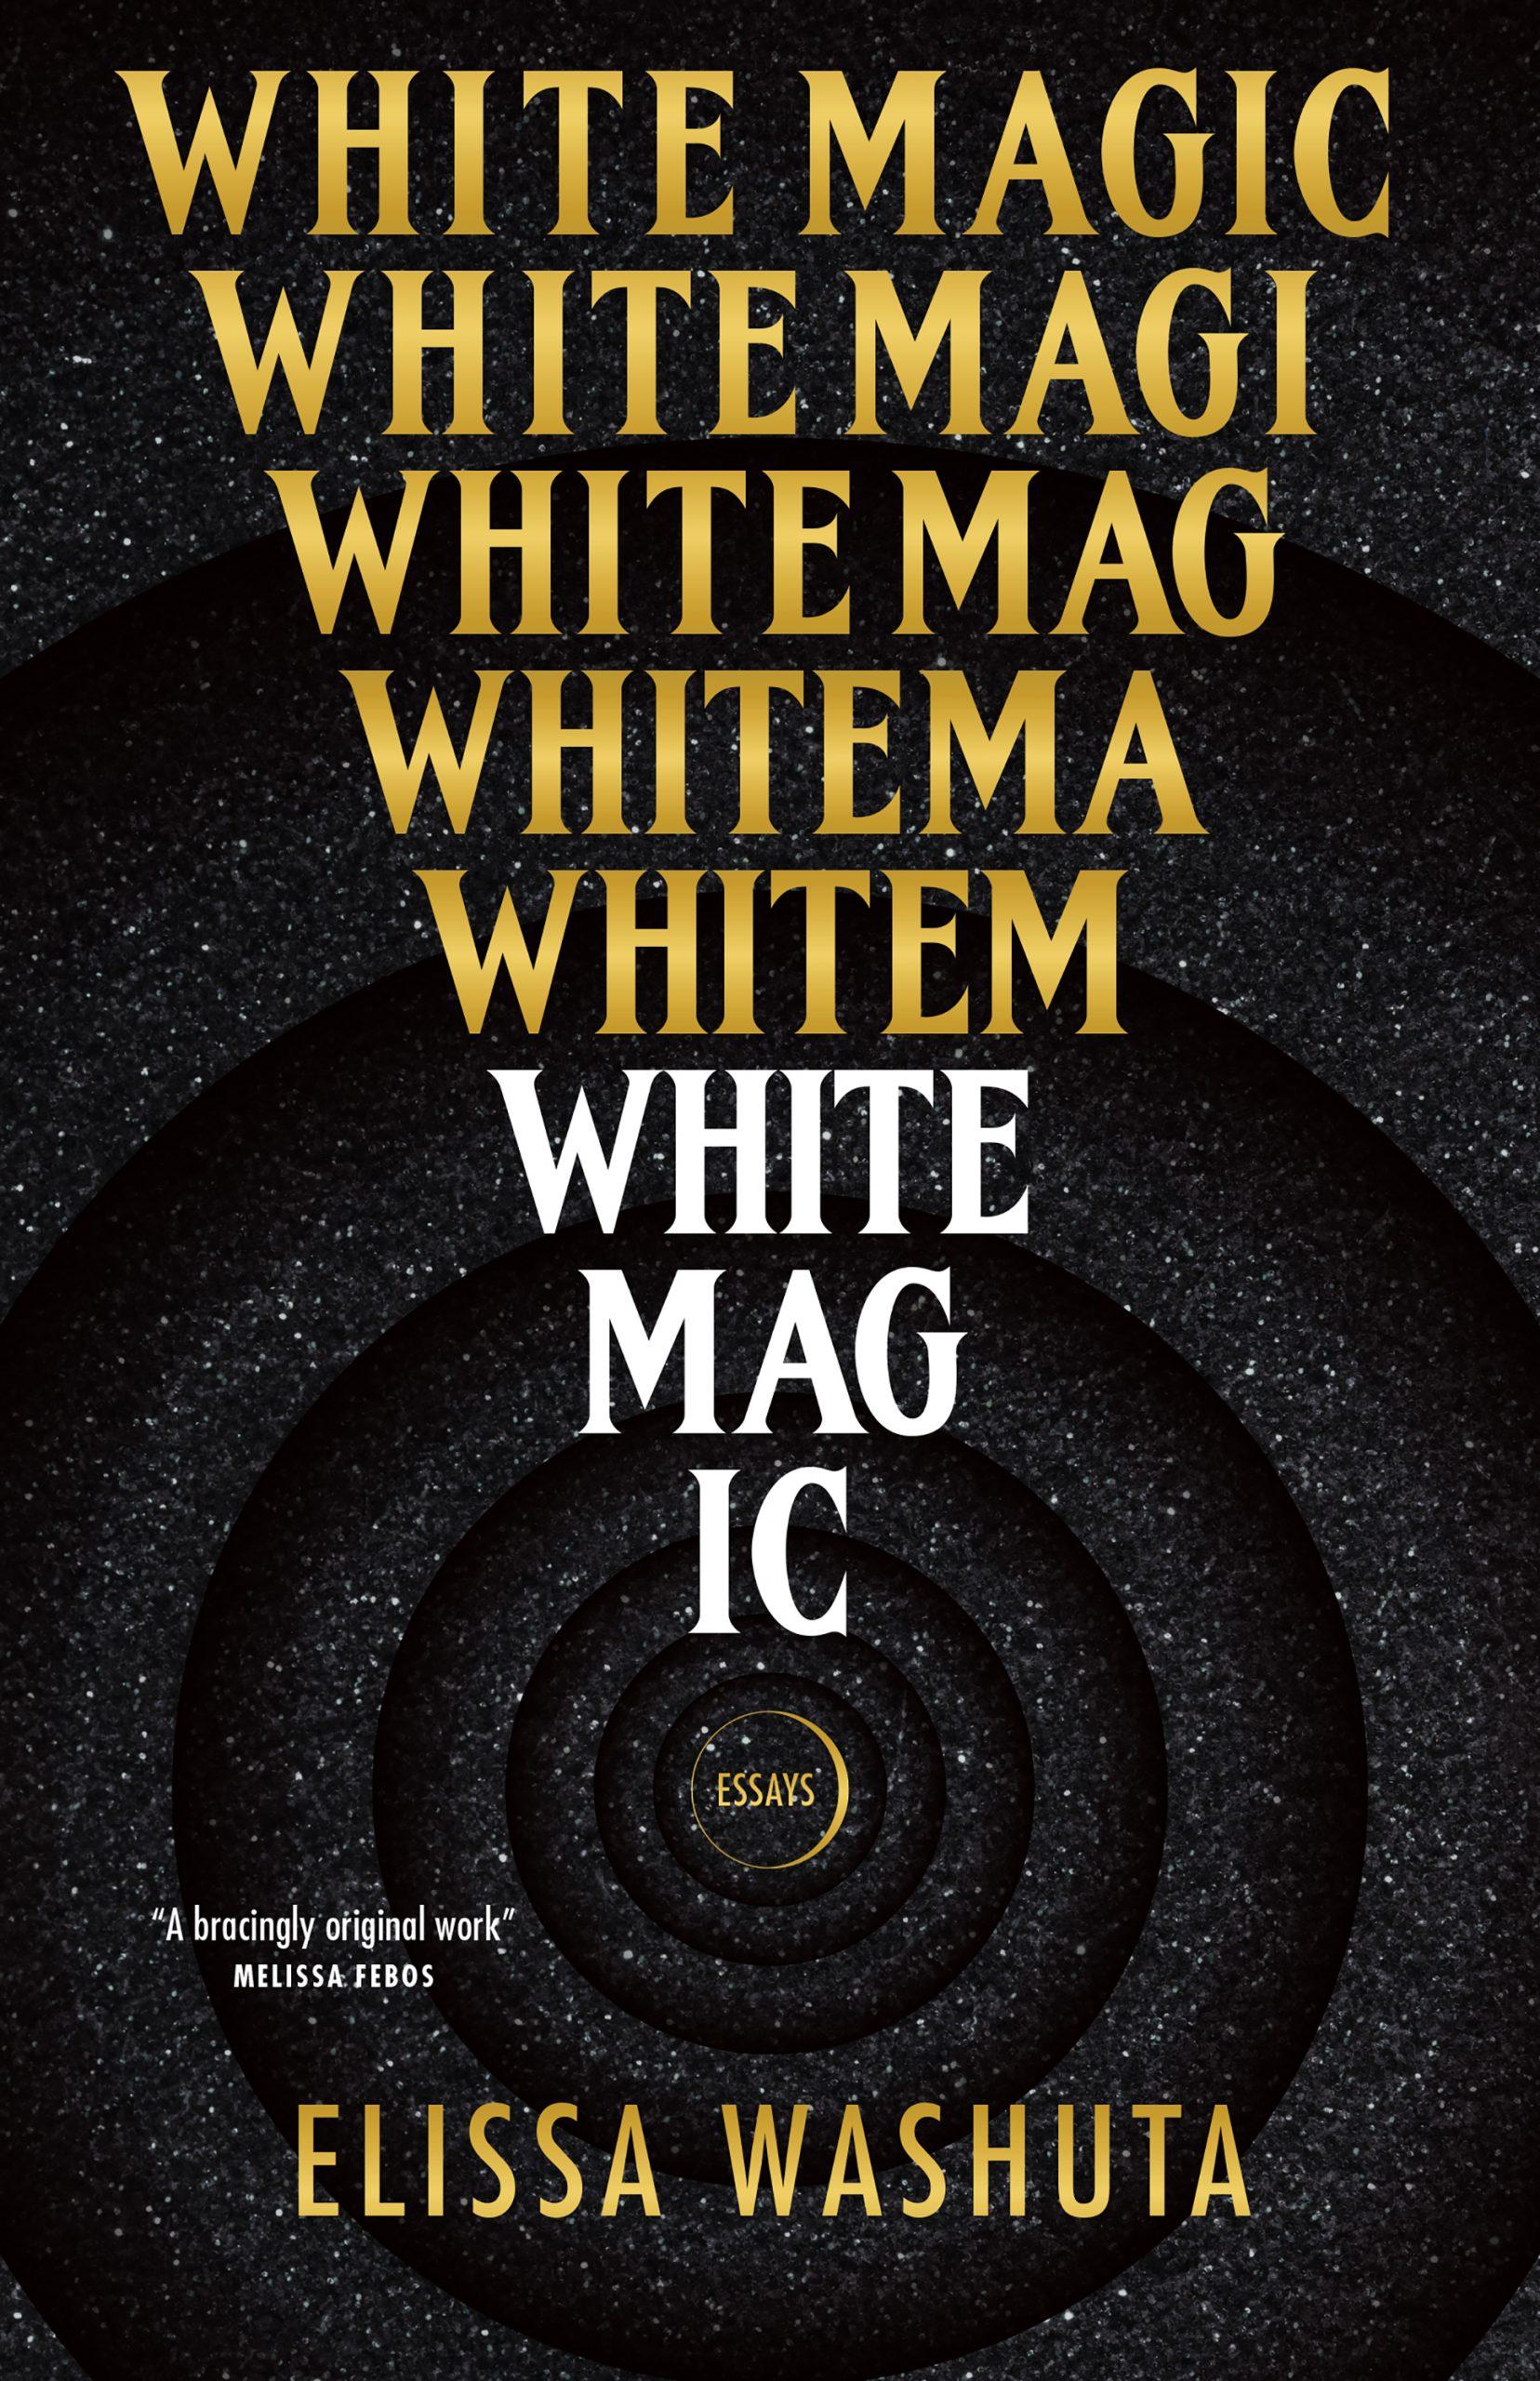 Book cover for White Magic.